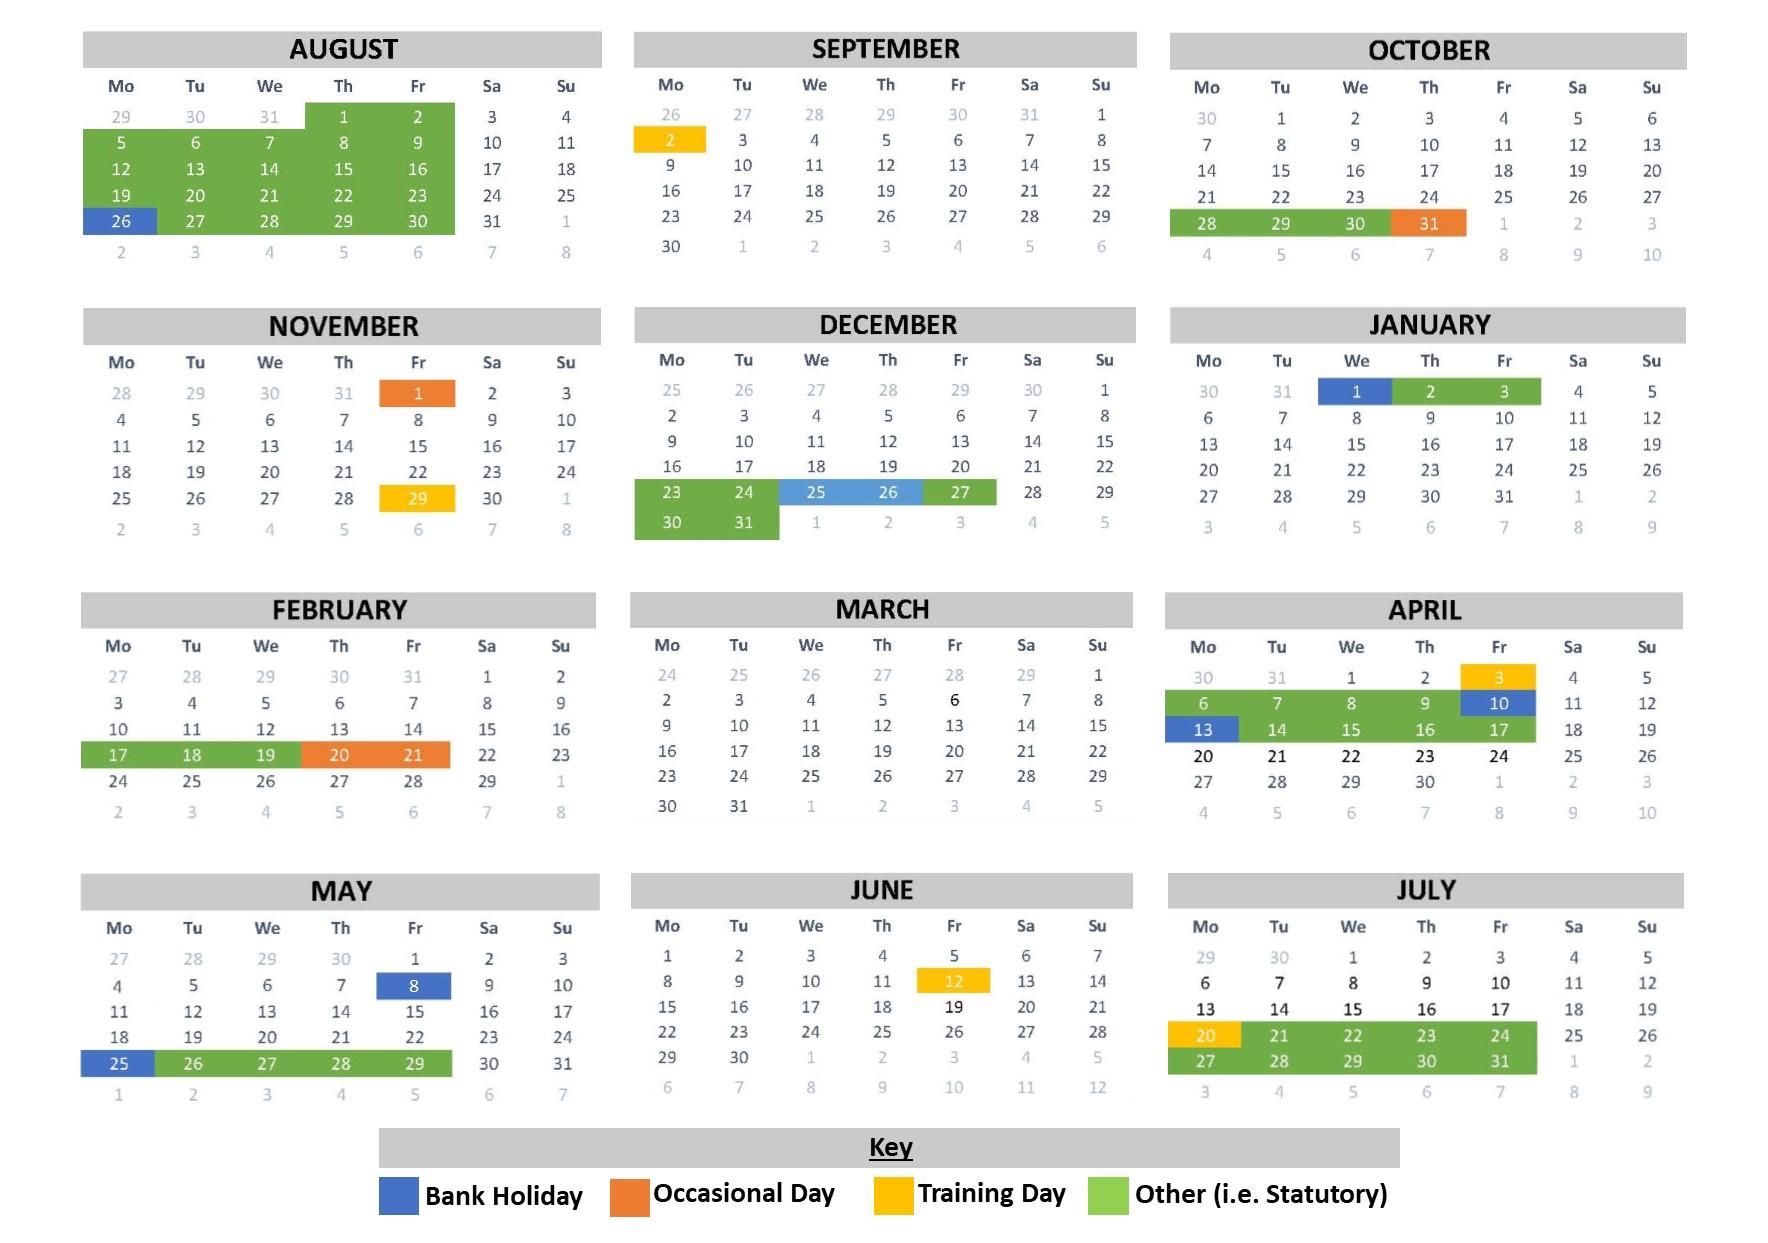 School Calendar | Beckfoot School Intended For University Of Northern Colorado Academic Calendar 2020 Fall